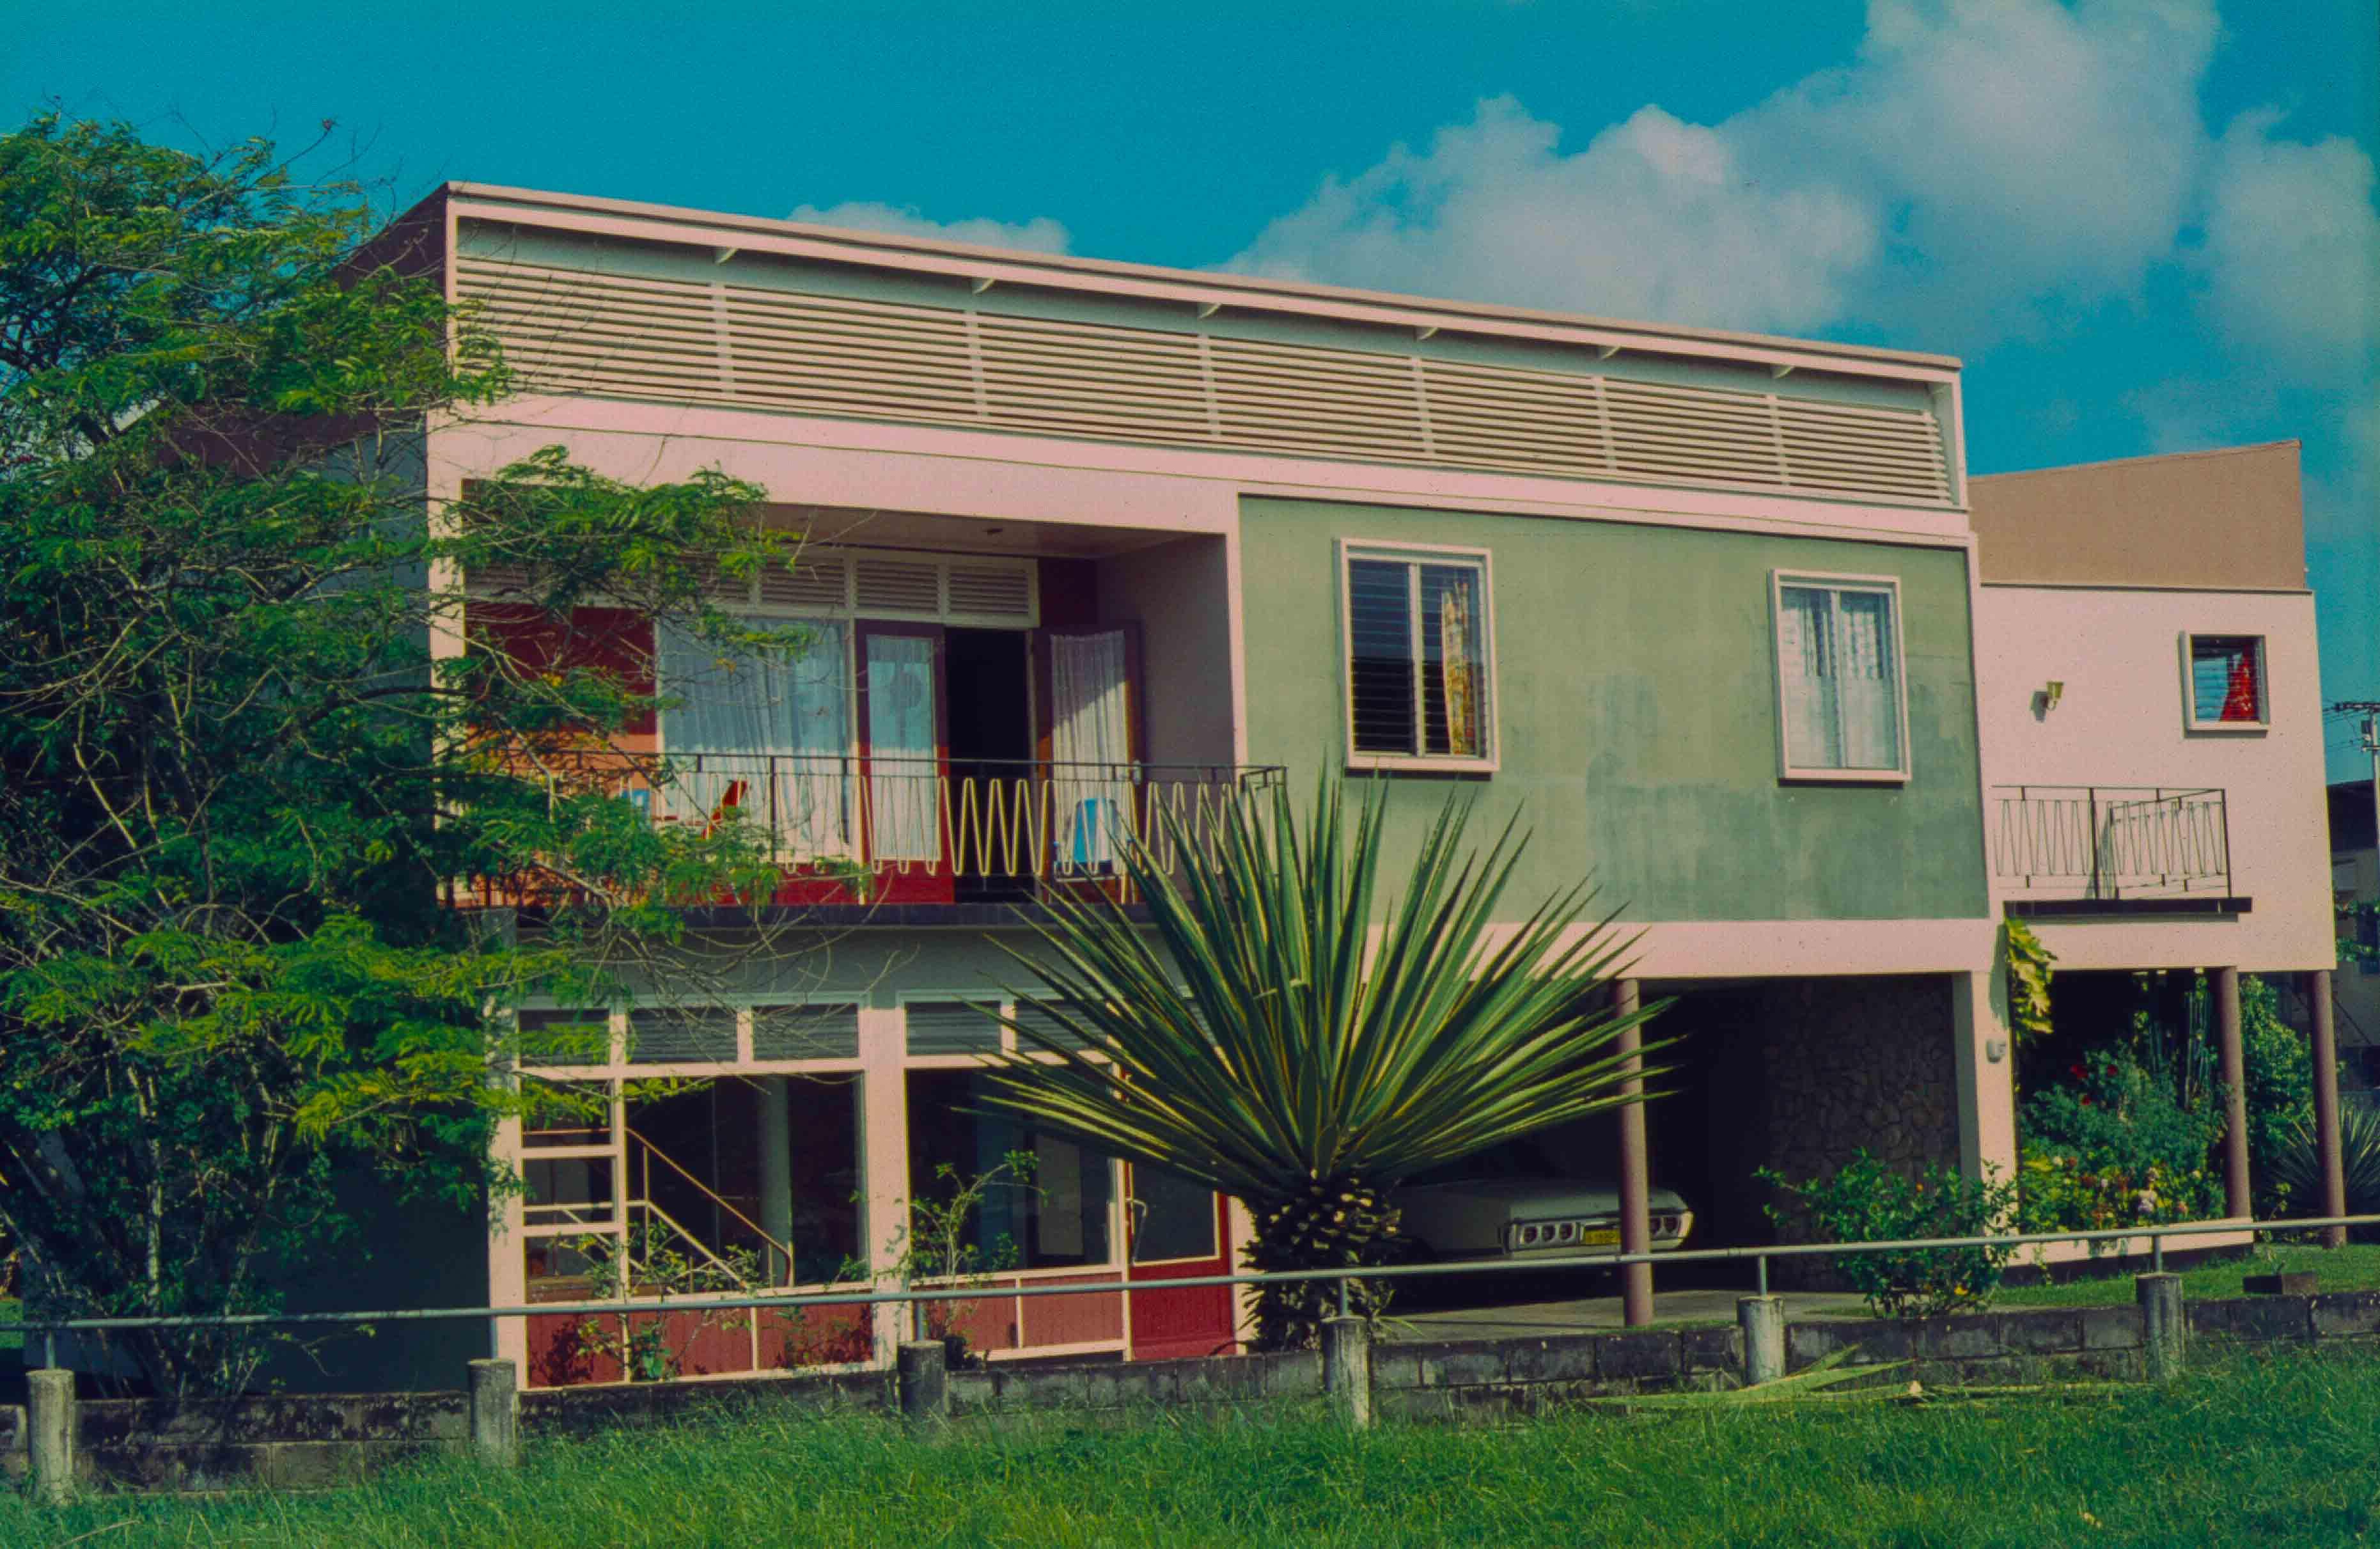 217. Suriname